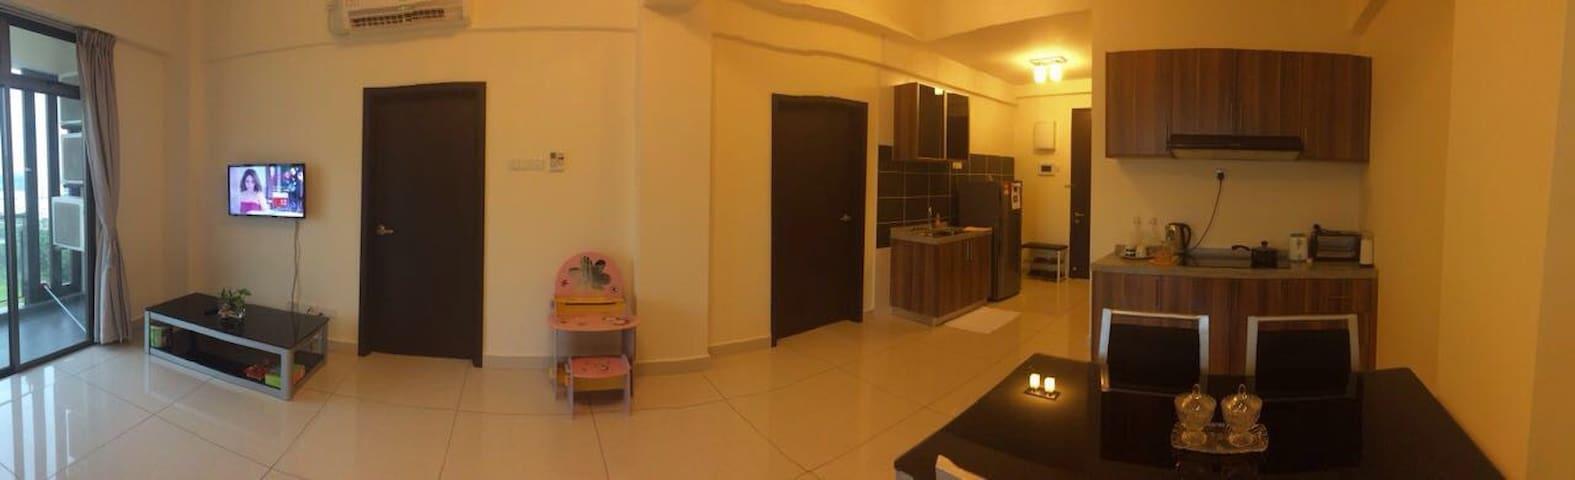 2Bedrooms D'inspire Exec Apt - Johor Bahru - Ortak mülk